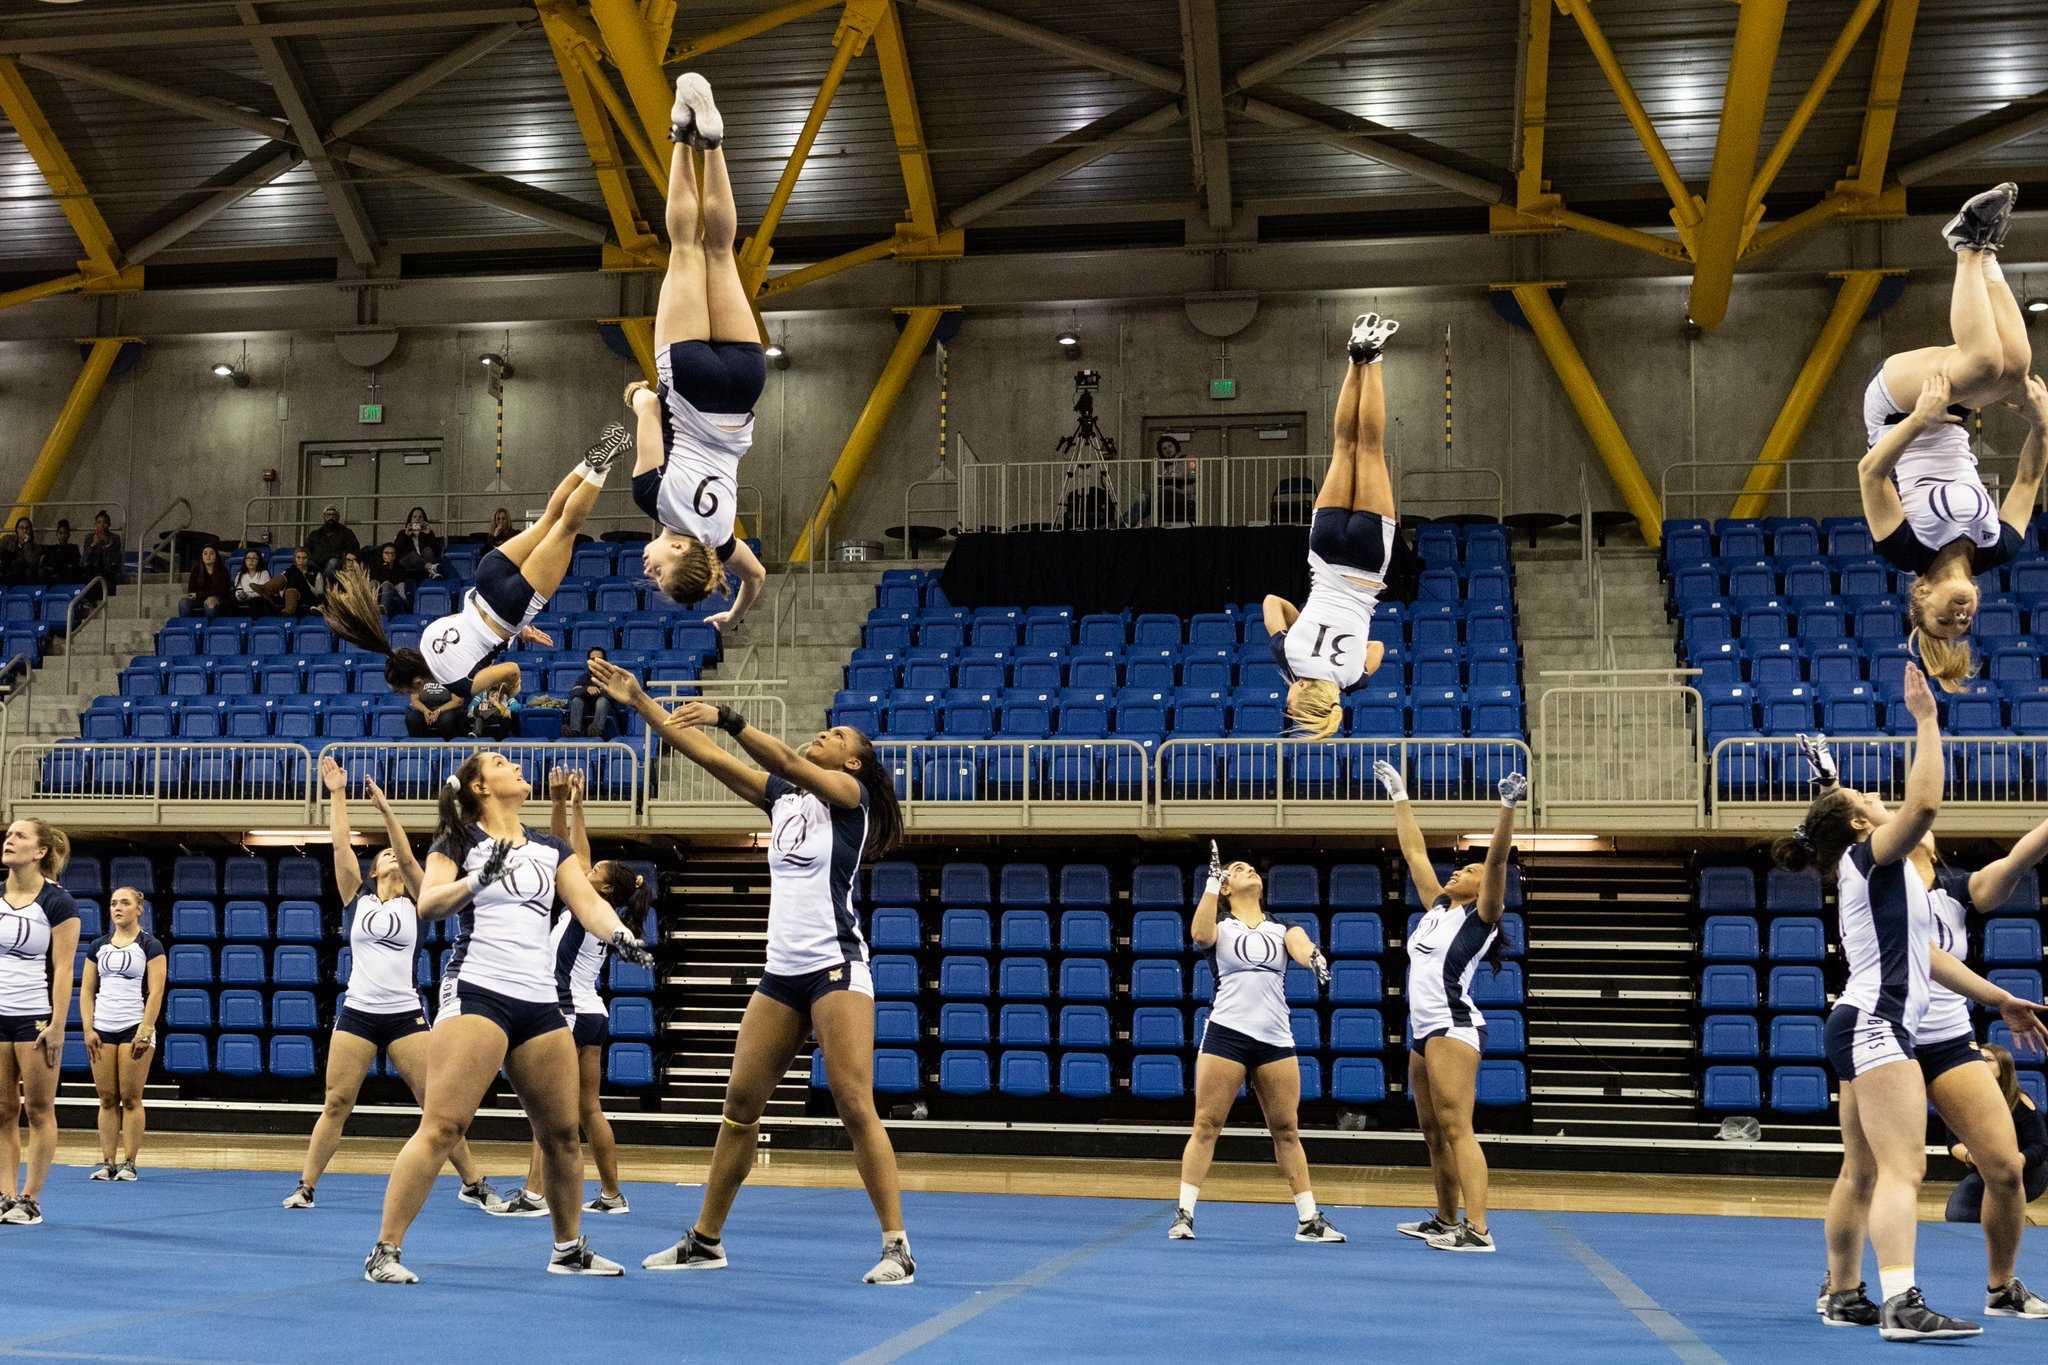 Quinnipiac acrobatics and tumbling win first meet of the season